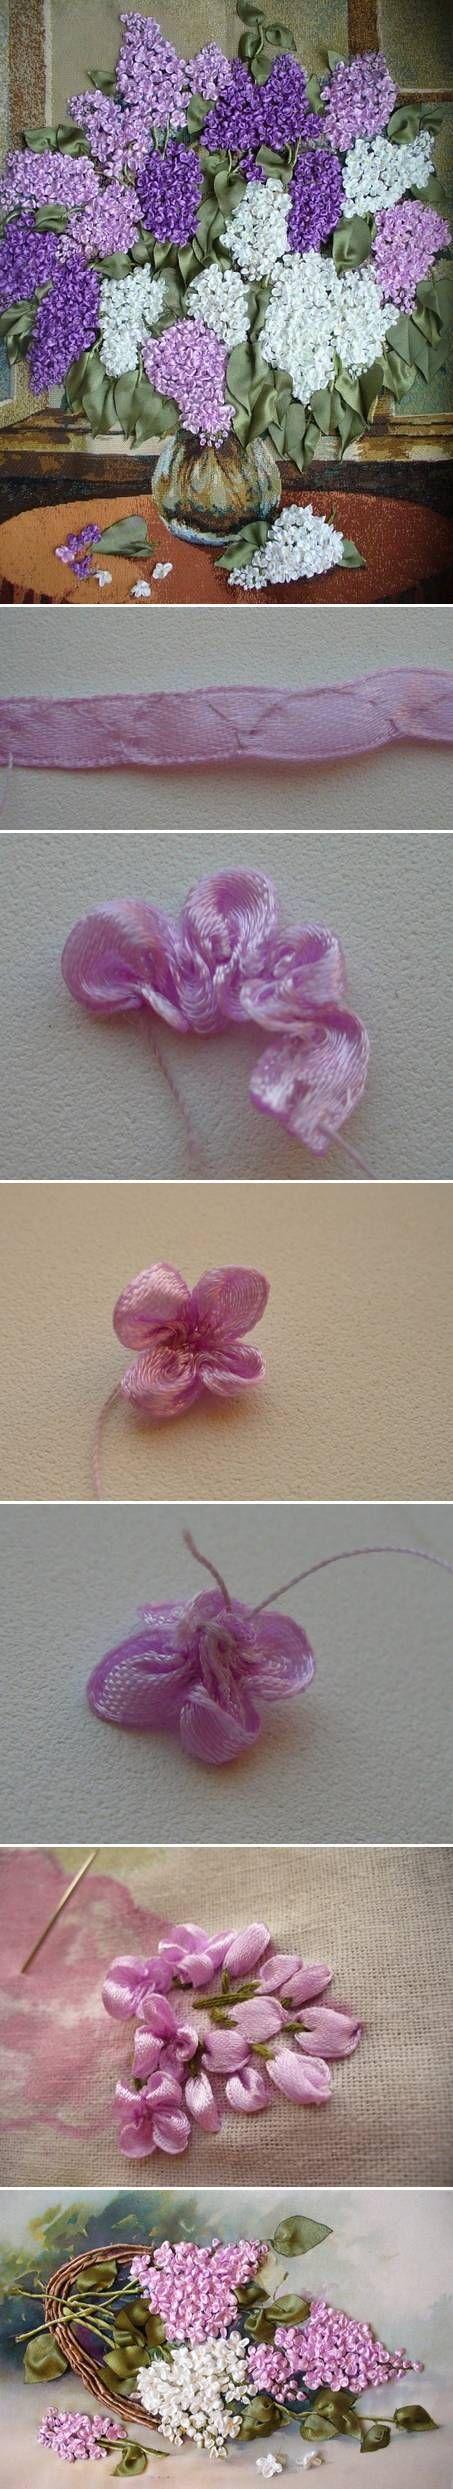 DIY Fabric Lilac Flowers DIY Projects | UsefulDIY.com